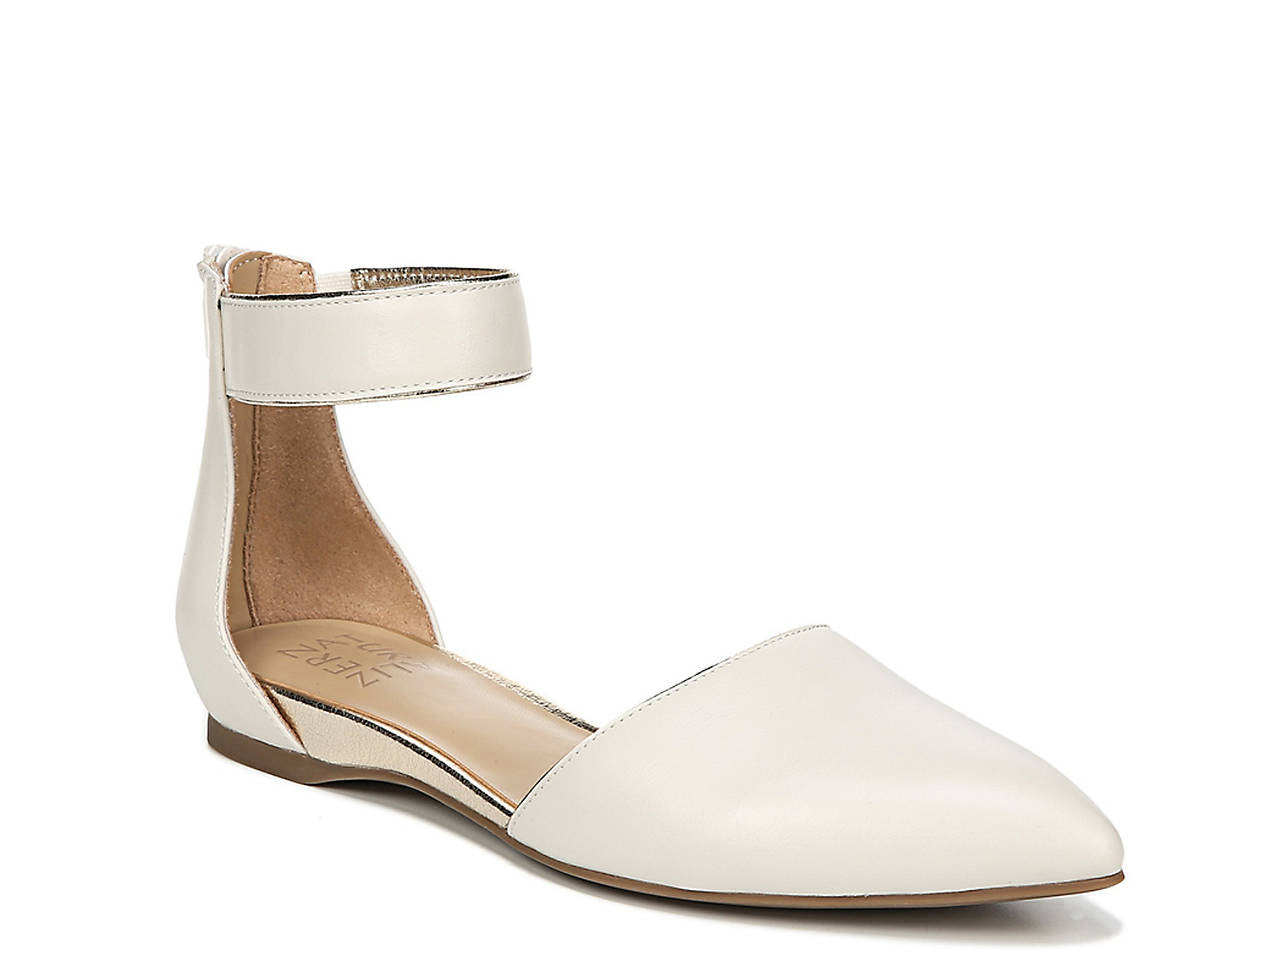 e0747748f82b Naturalizer Trance Flat Women s Shoes